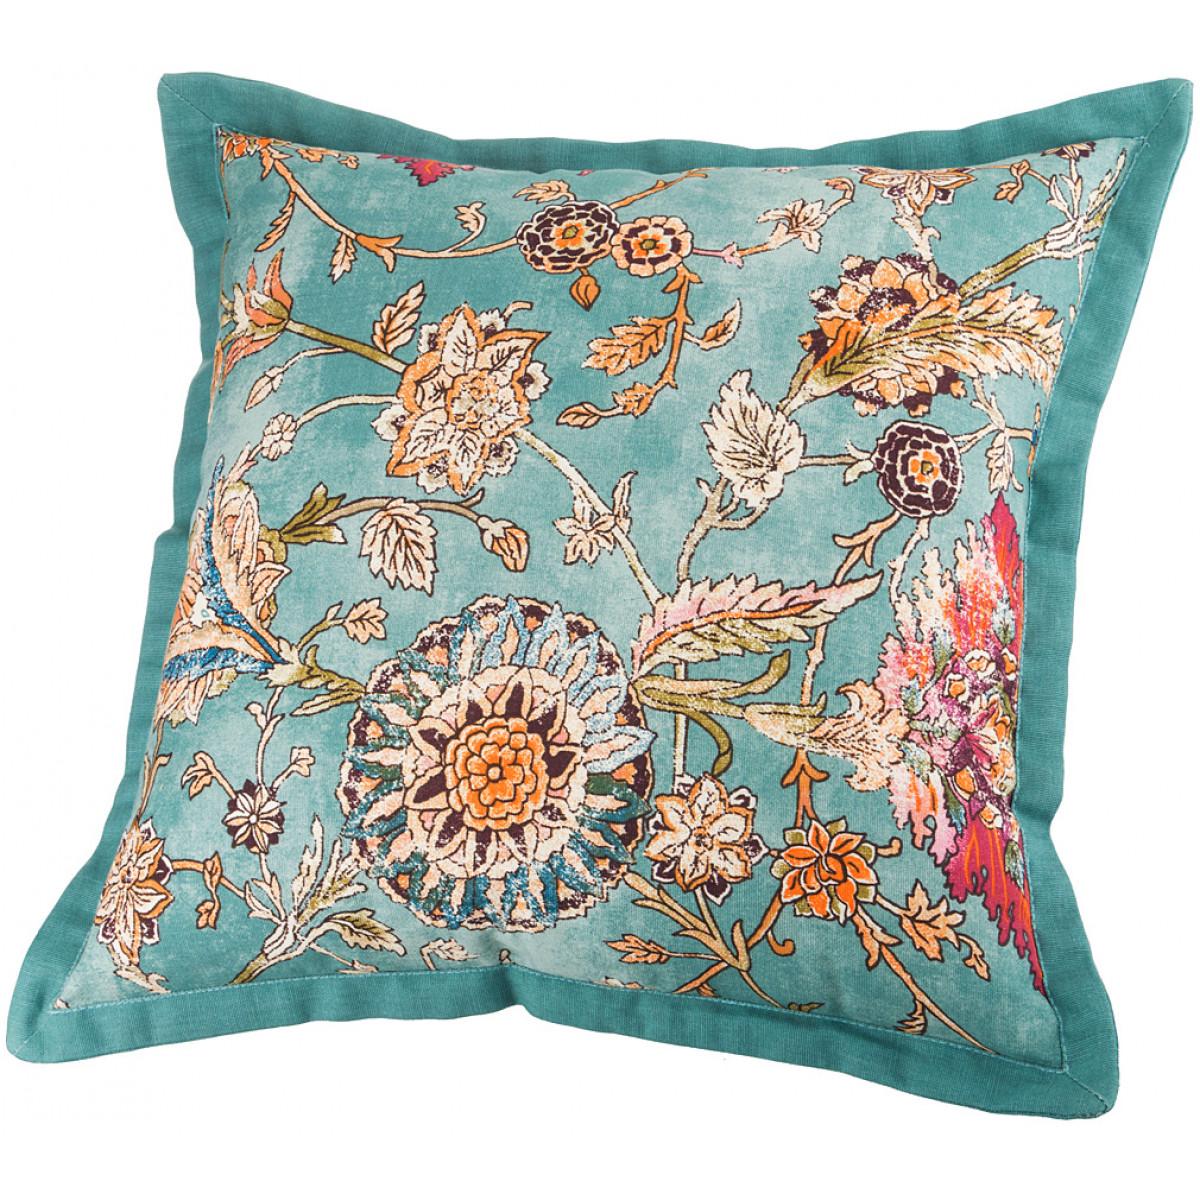 Декоративные подушки Santalino Декоративная подушка Kipp (45х45) подушка декоративная santalino райский сад 850 818 6